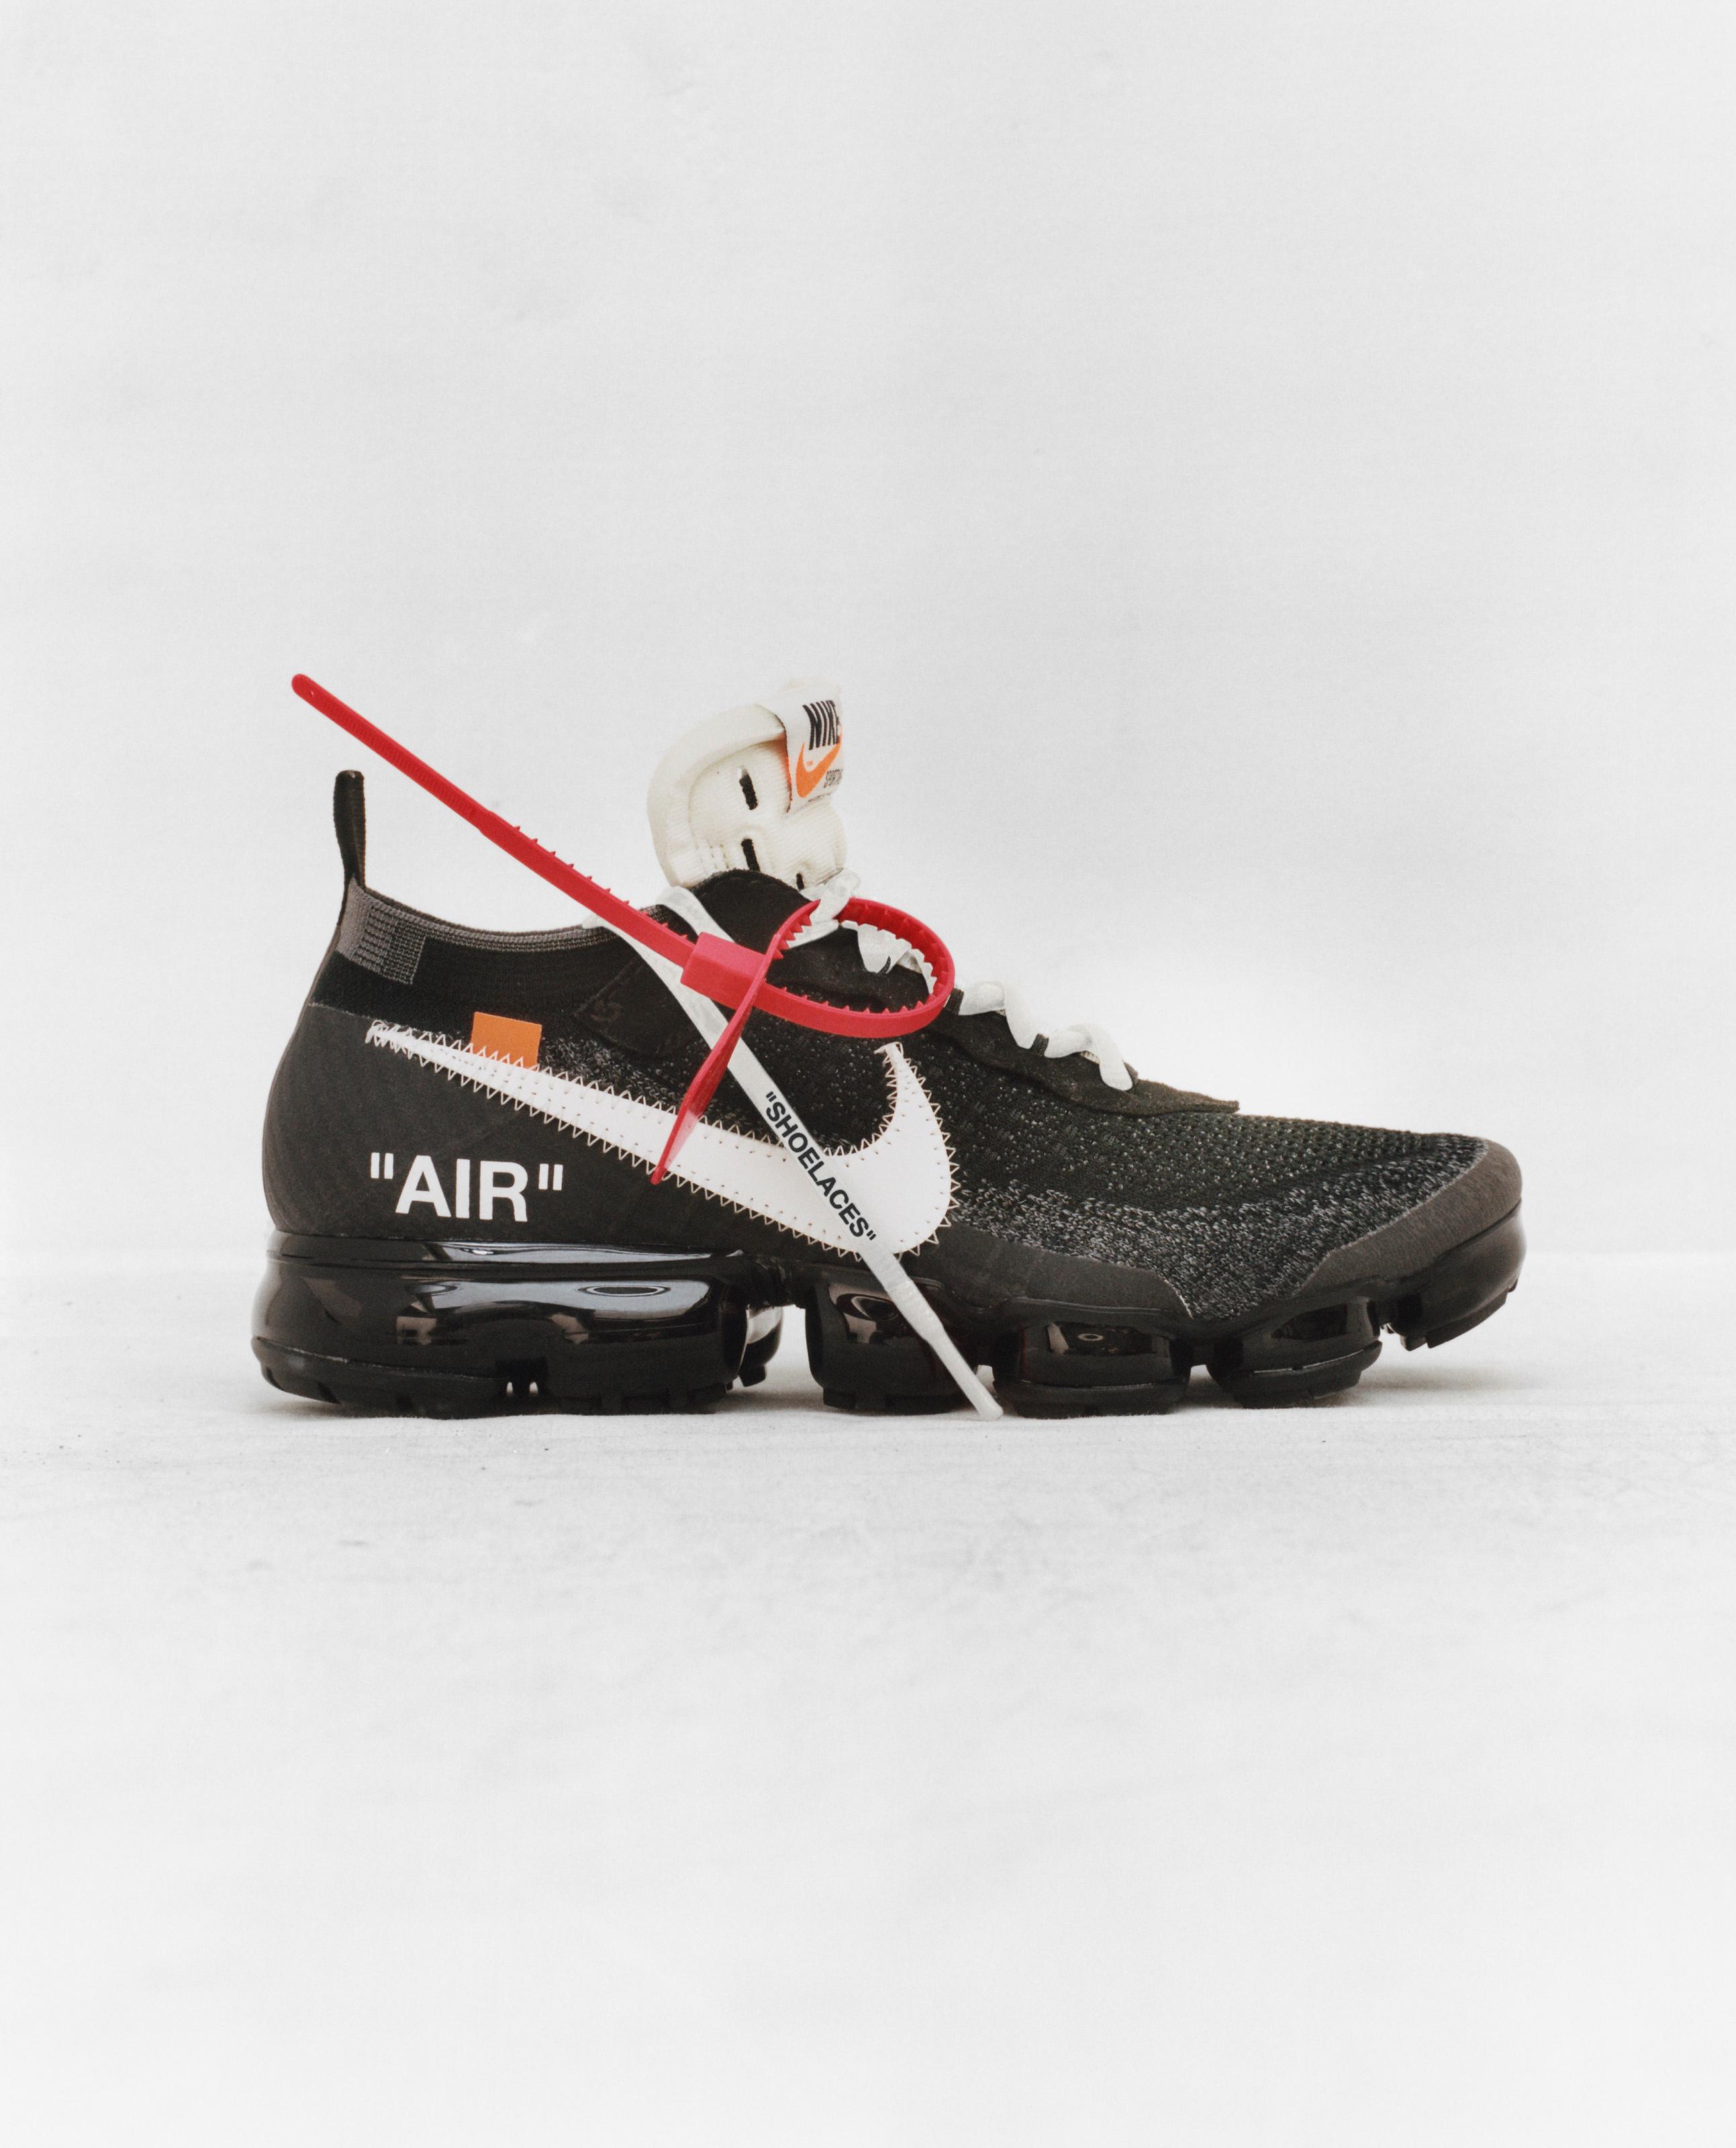 Virgil-Abloh-Nike-The10-10_73198.jpg